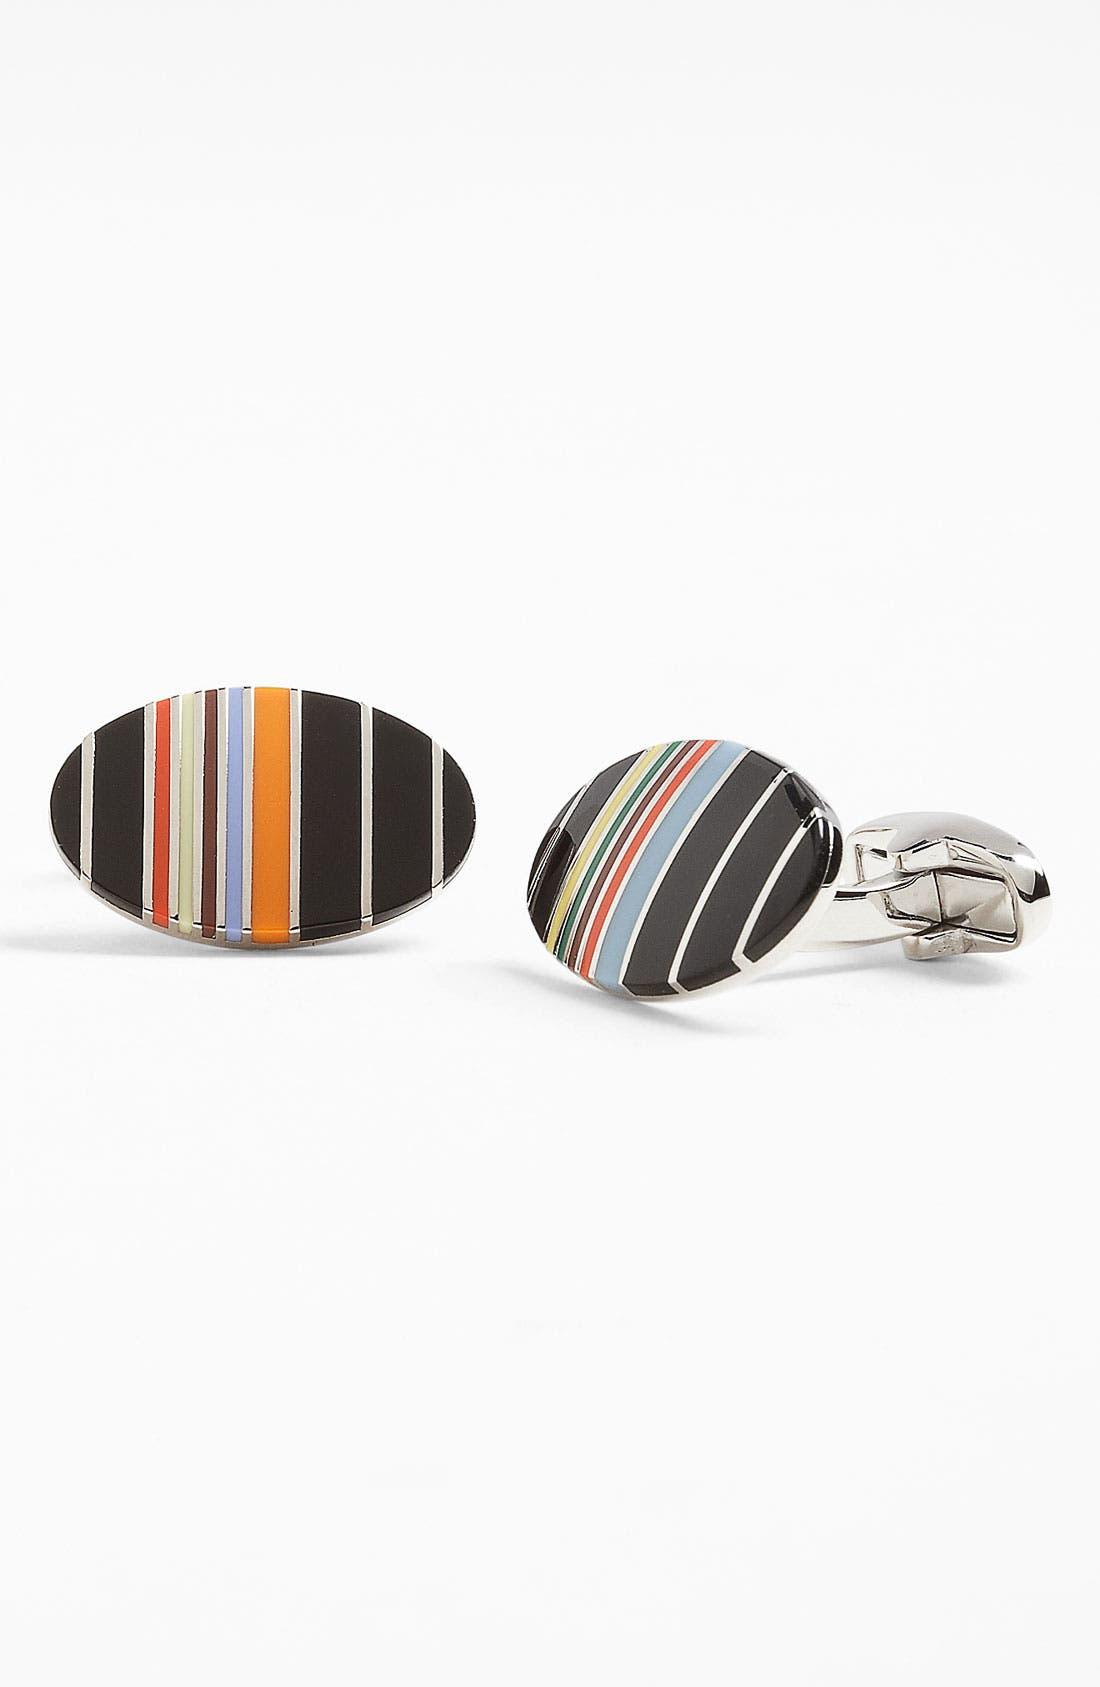 Main Image - Paul Smith Accessories Stripe Cuff Links